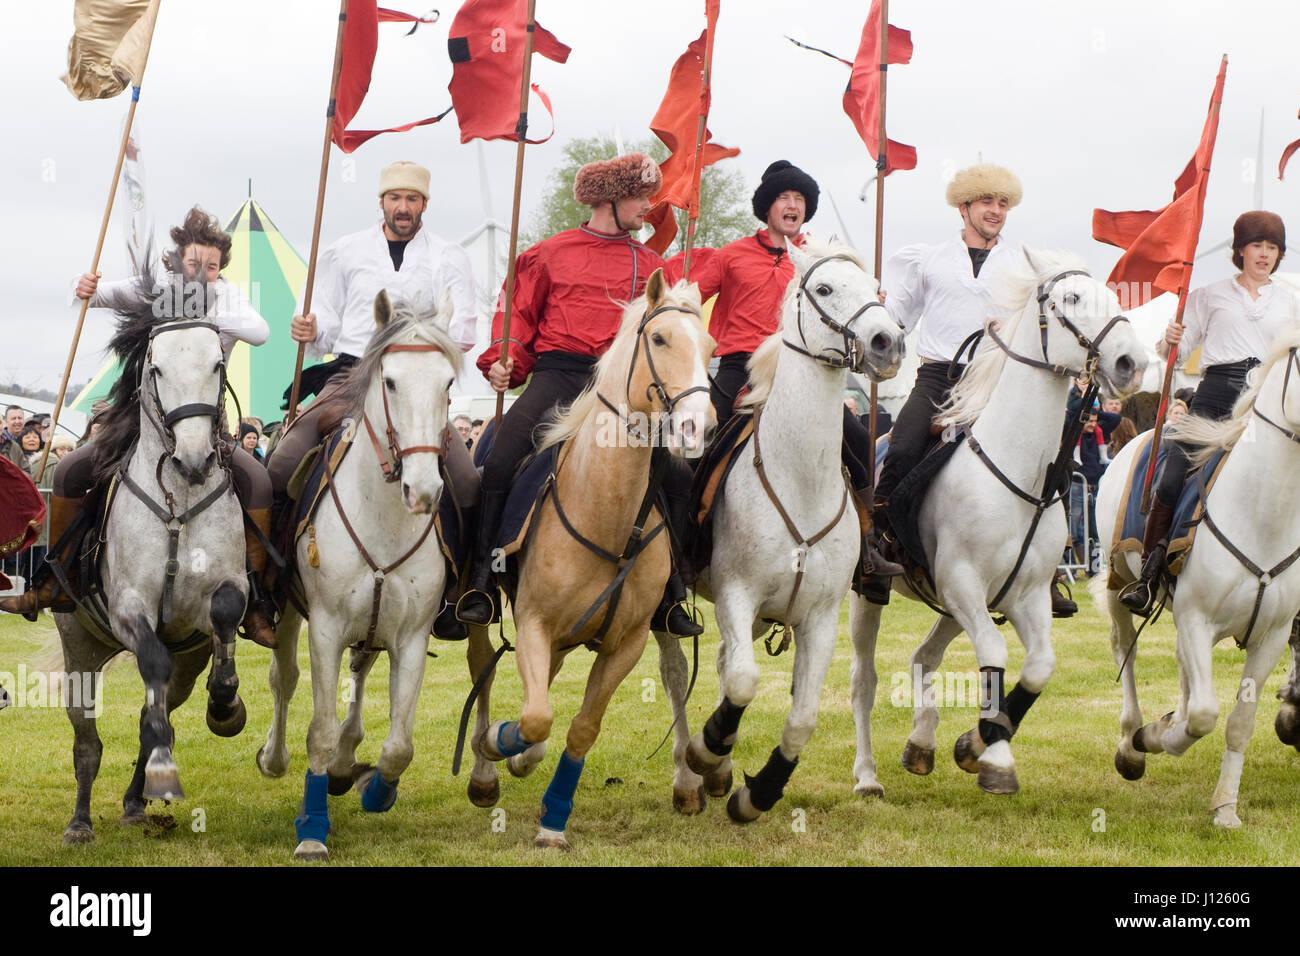 The Devils horsemen stunt team display - Stock Image